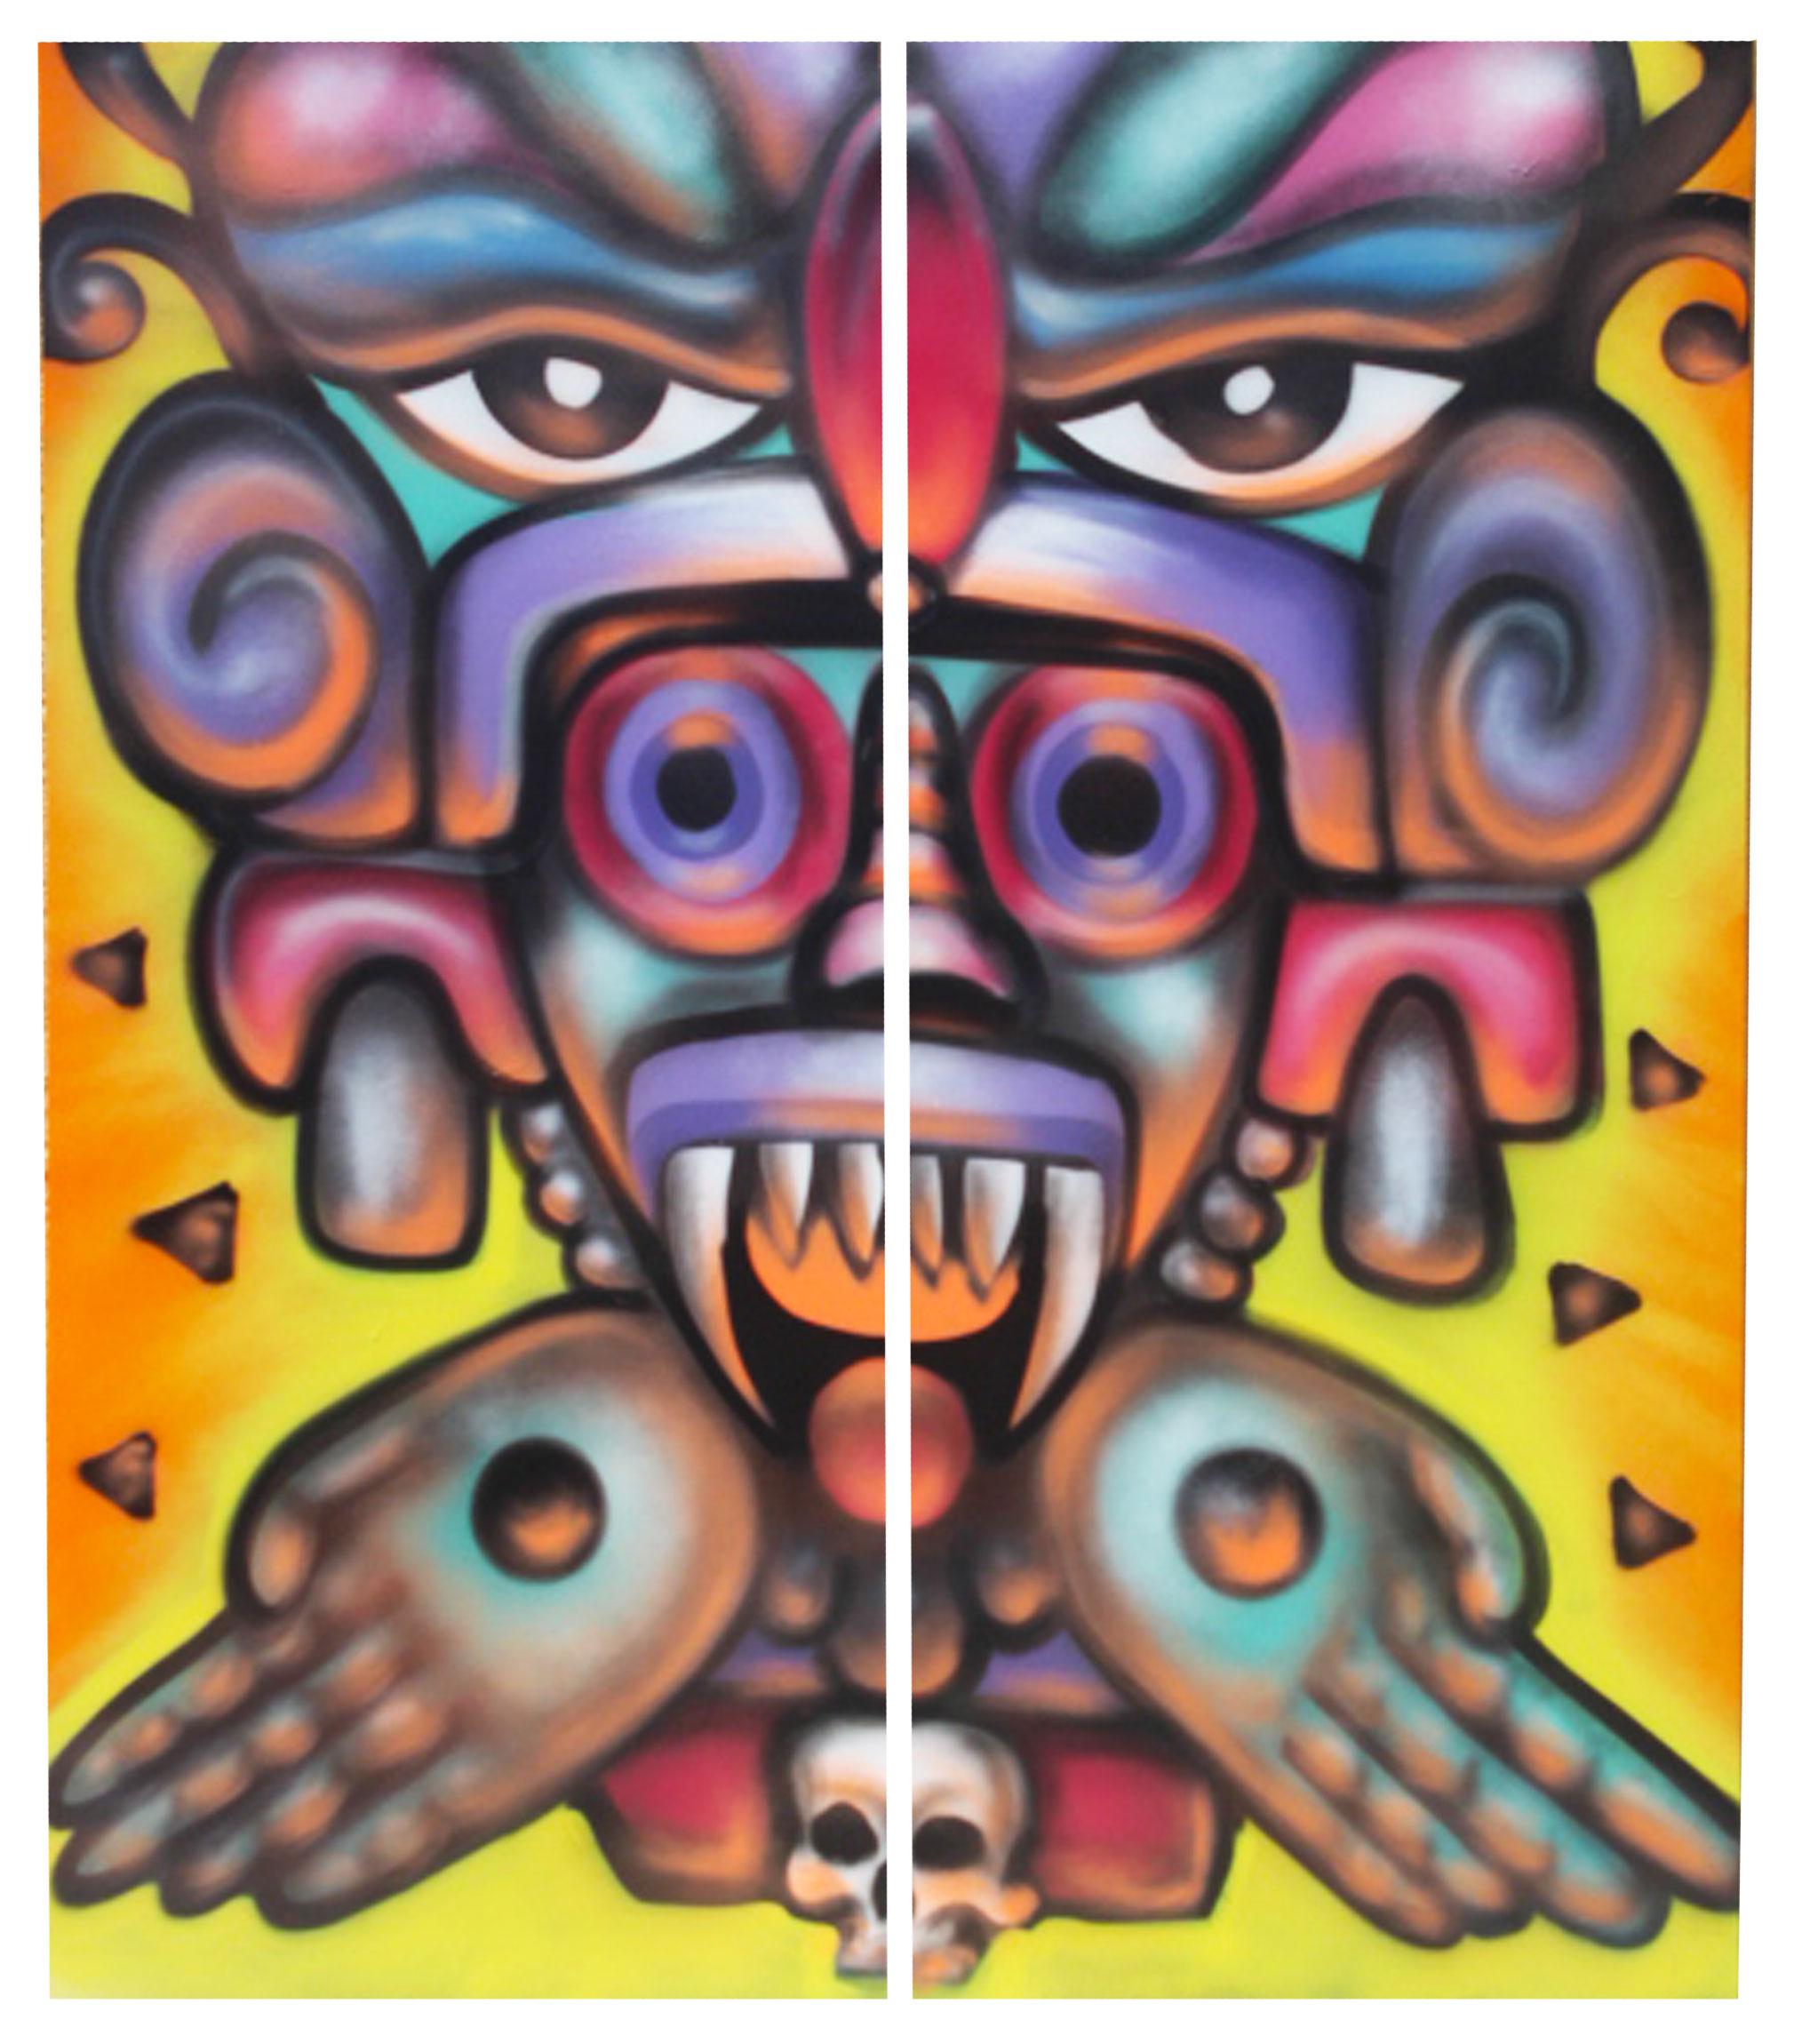 badder tlaloc-glass-grafitti-web